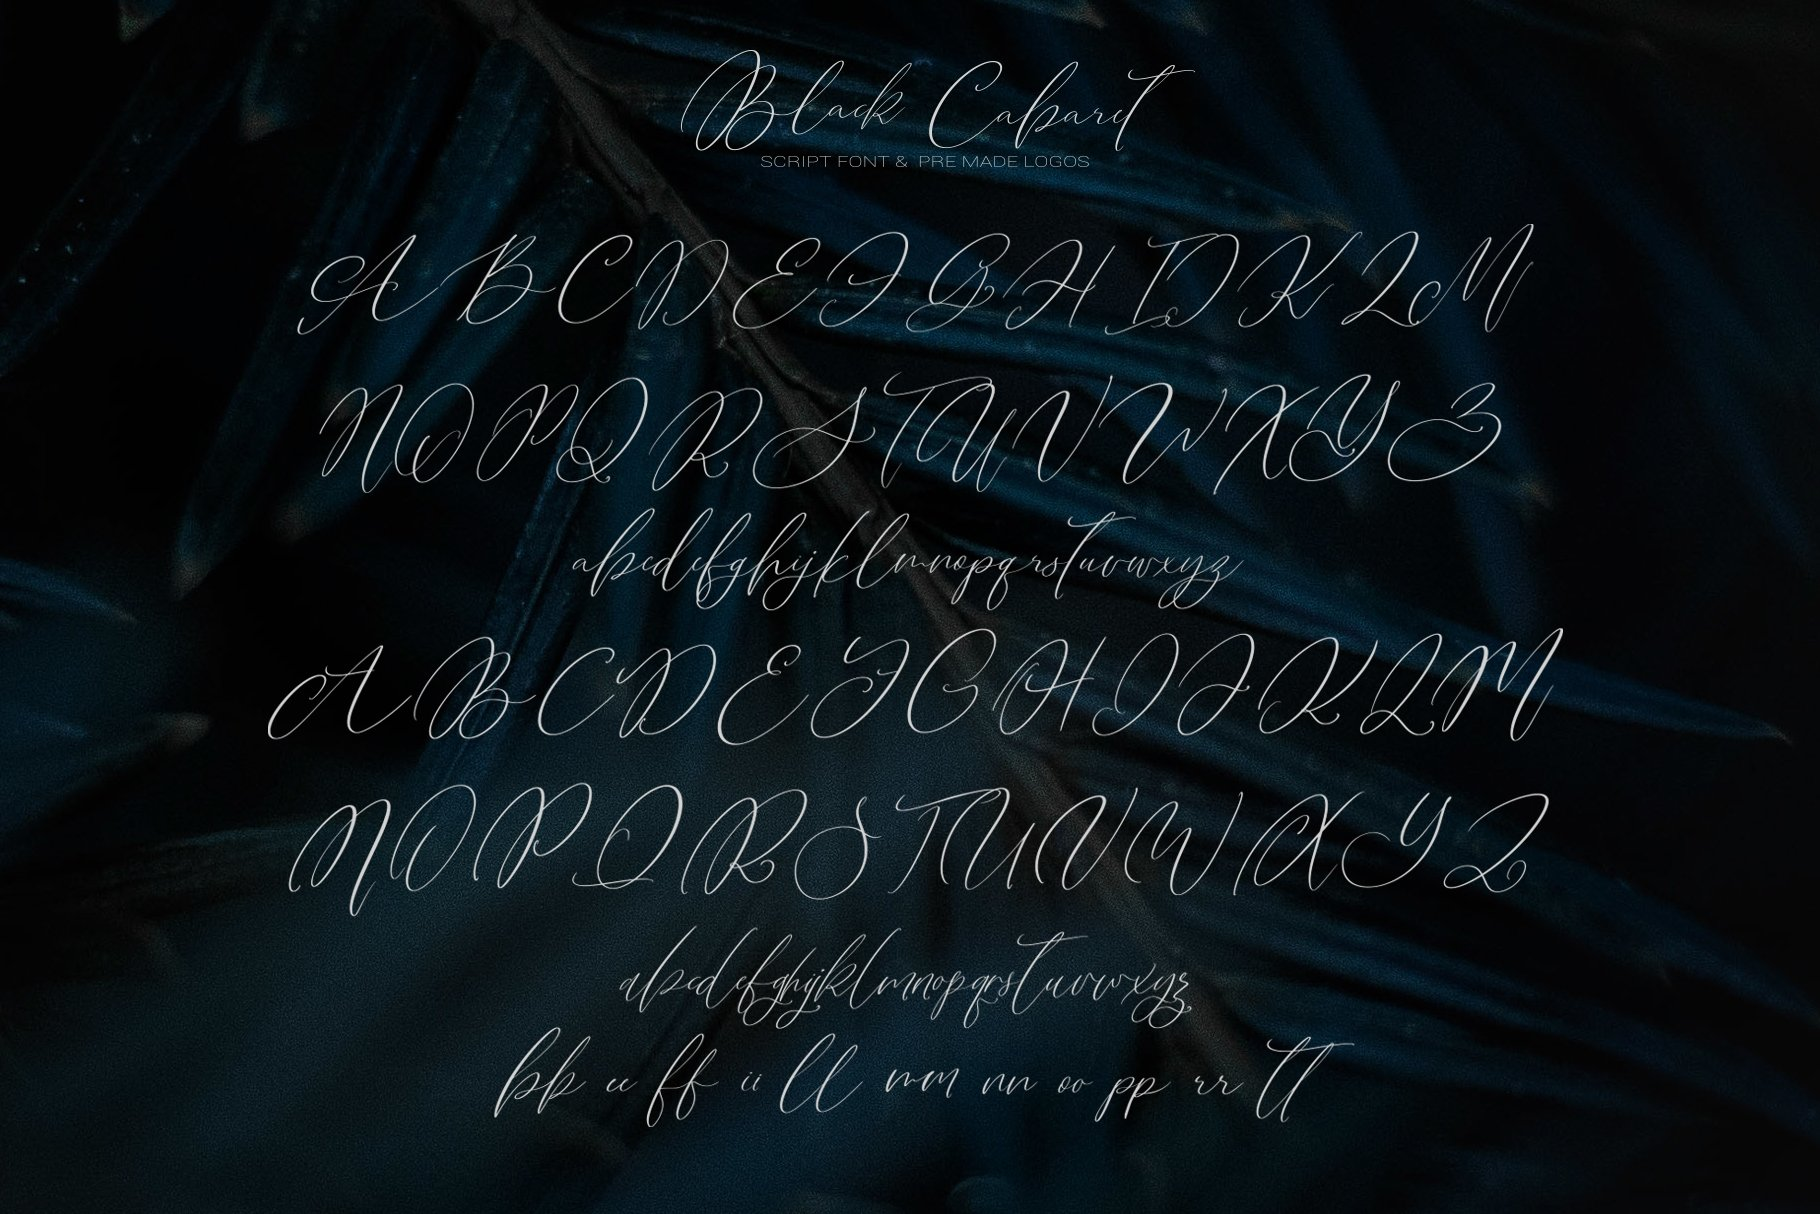 Black Cabaret Script Font & Logos example image 15